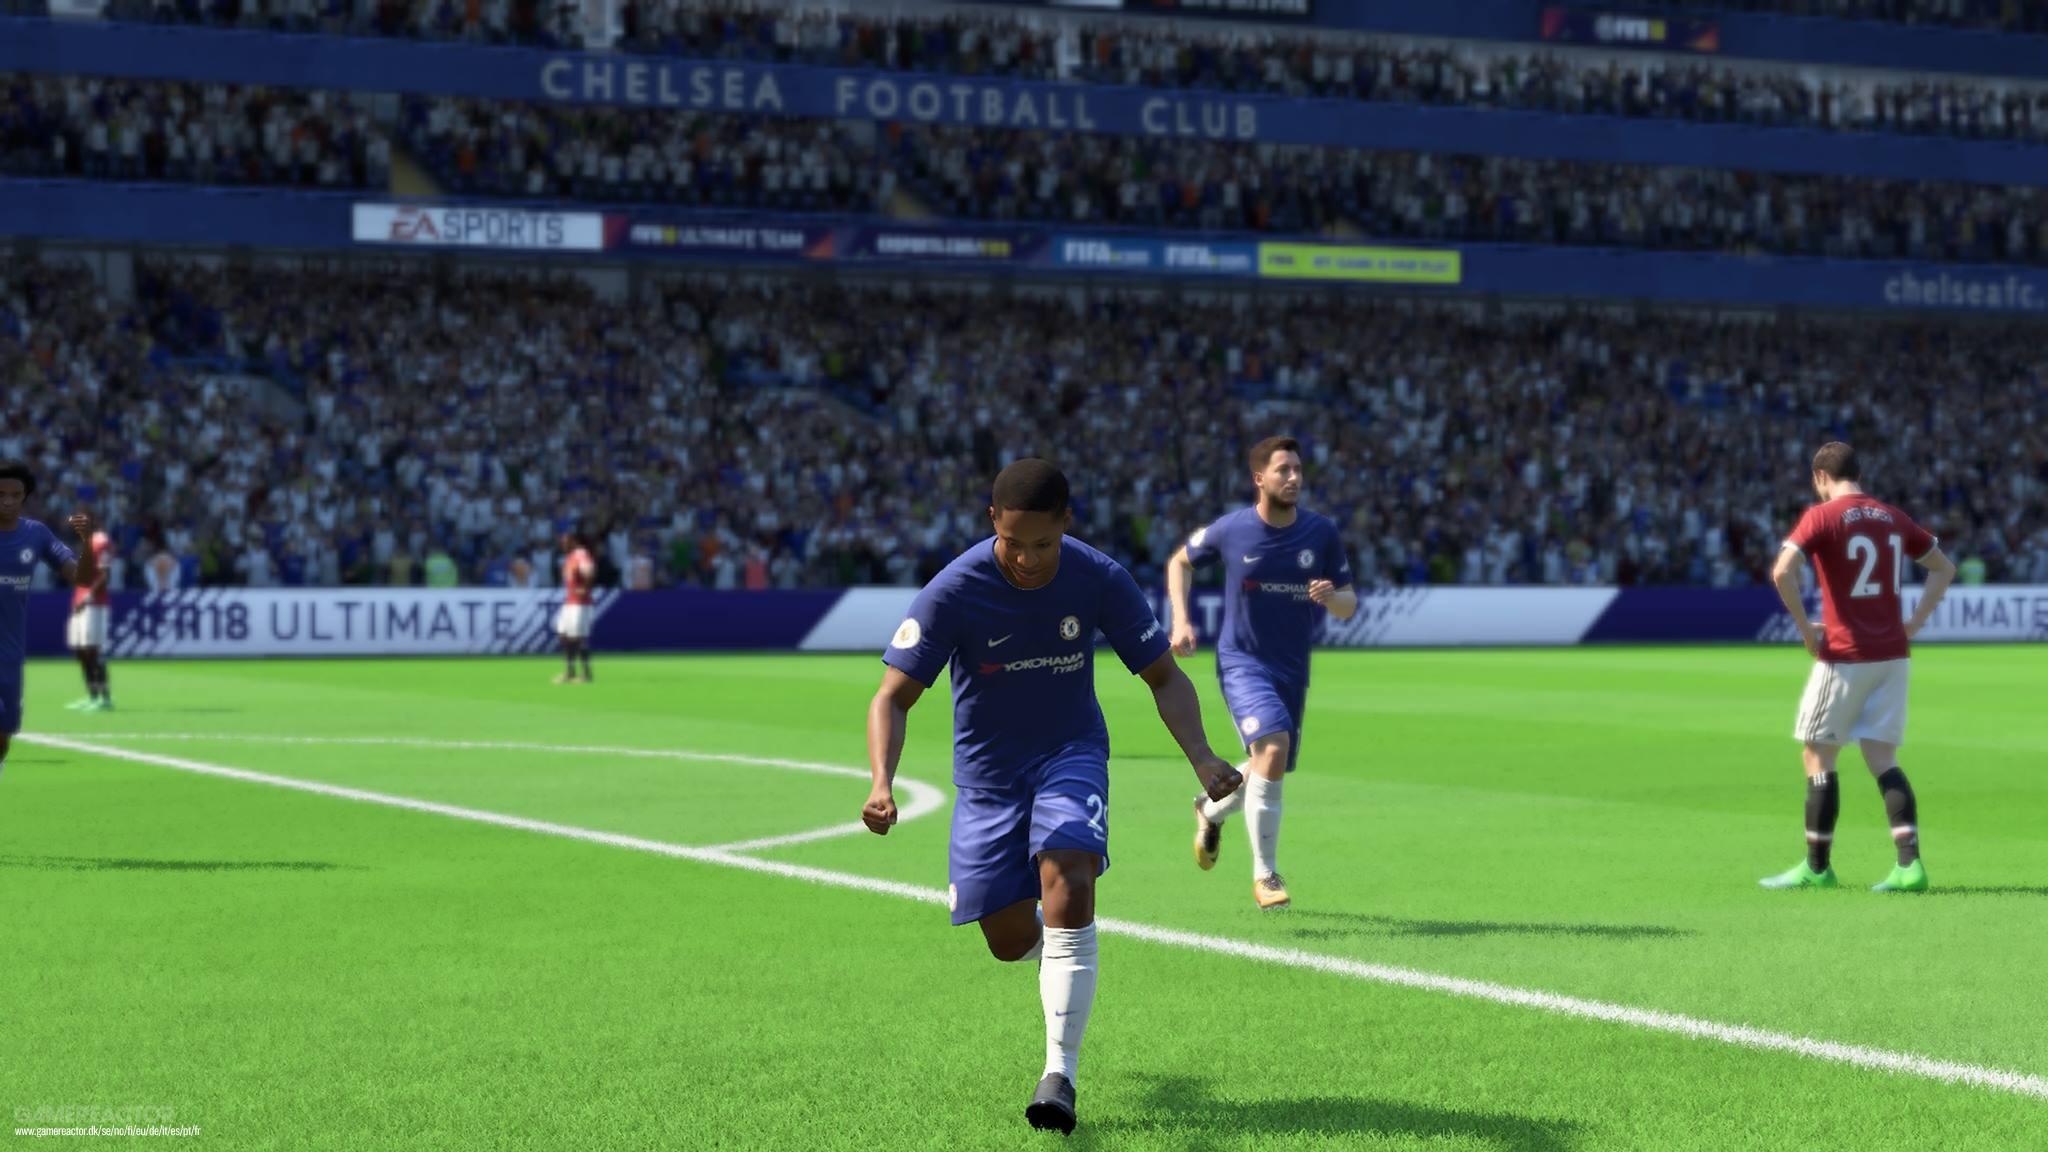 Pictures Of FIFA 18 Graphics Comparison PC Vs PS4 10 12